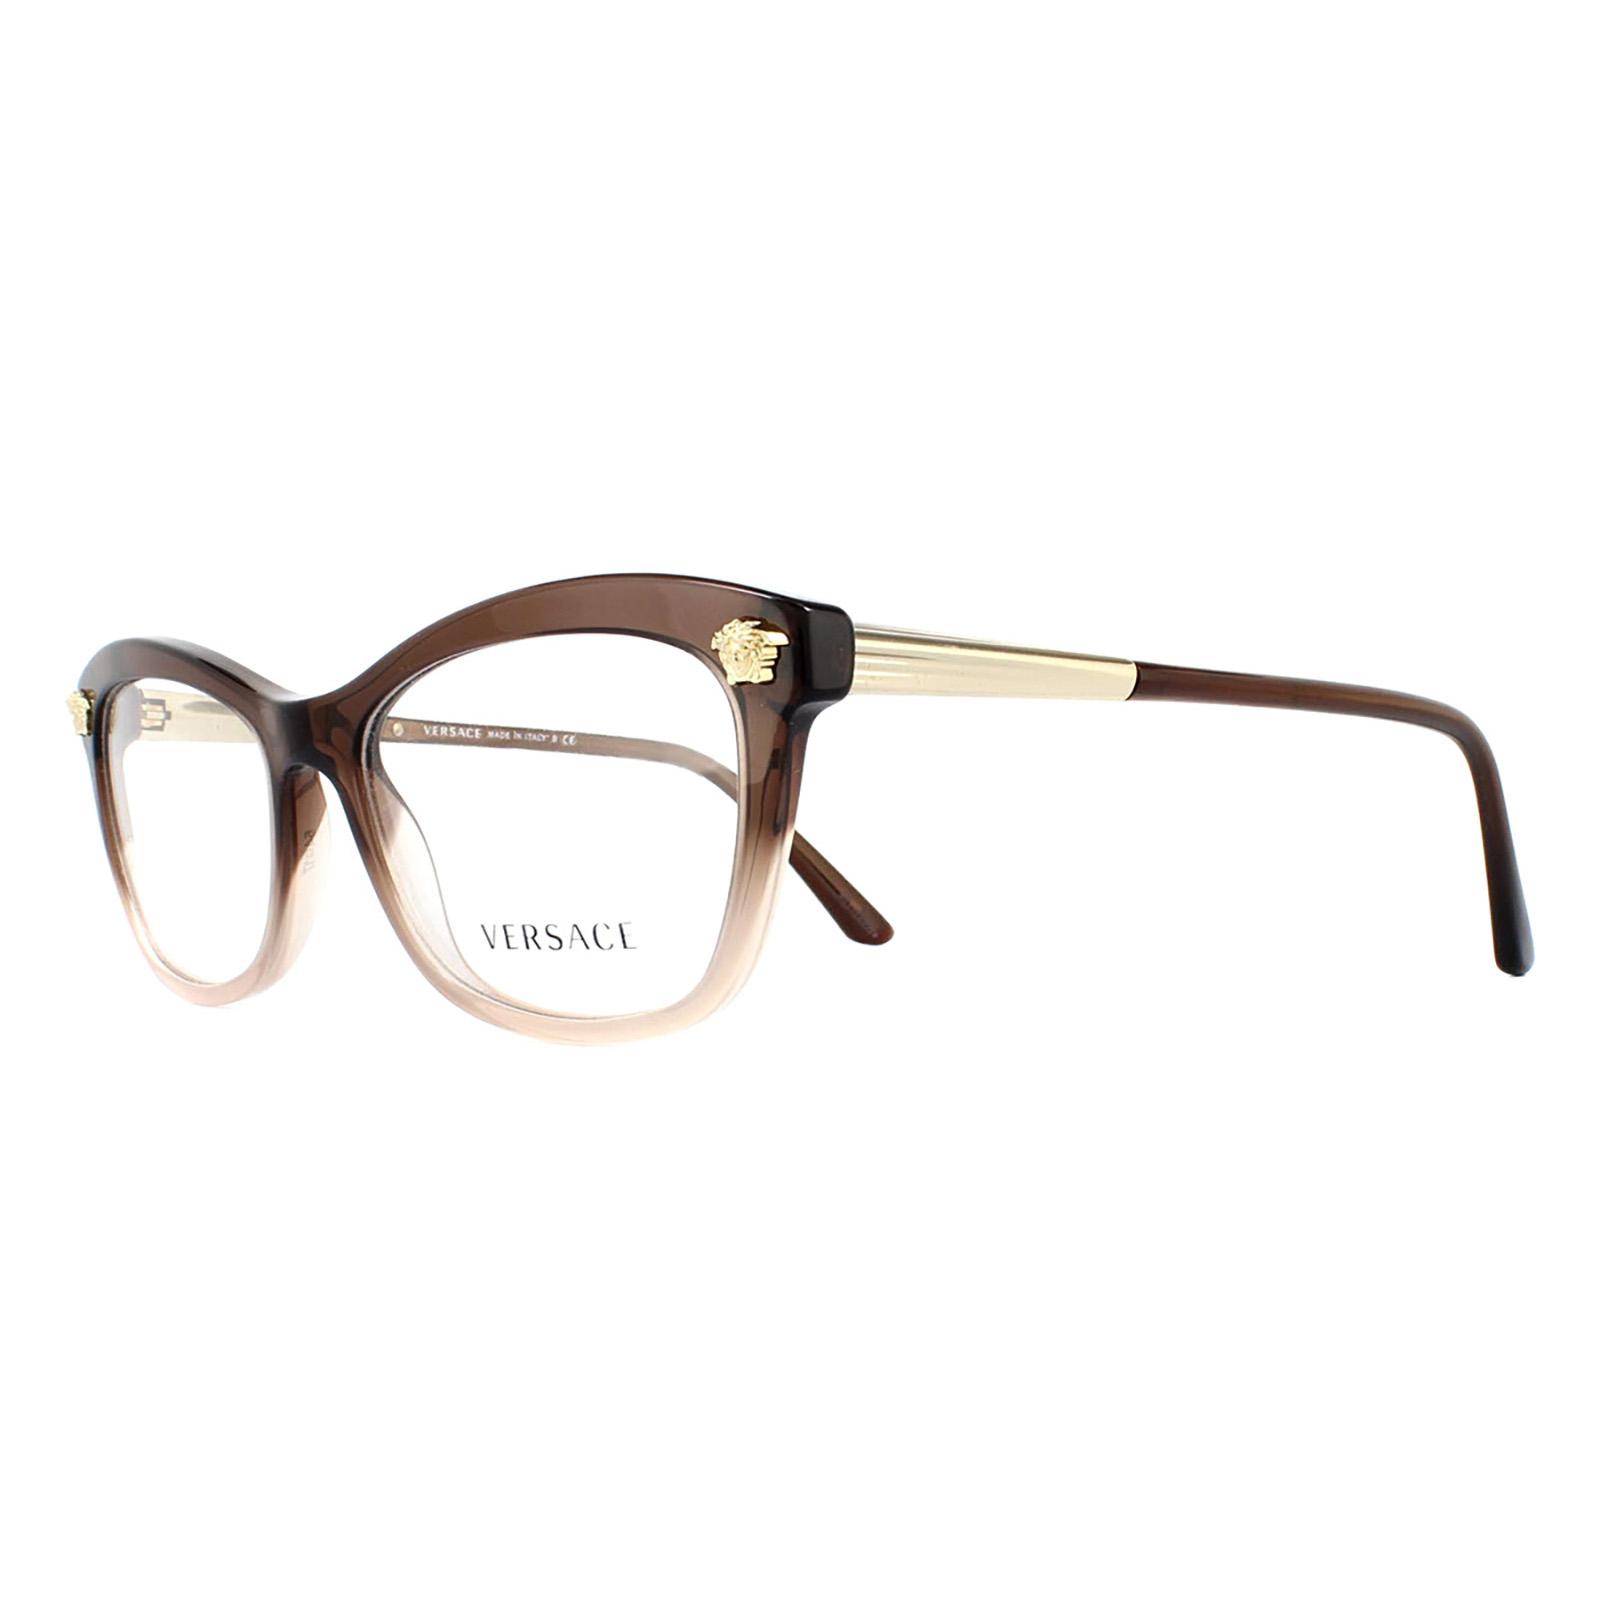 659c9b90aced Versace Frame Glasses